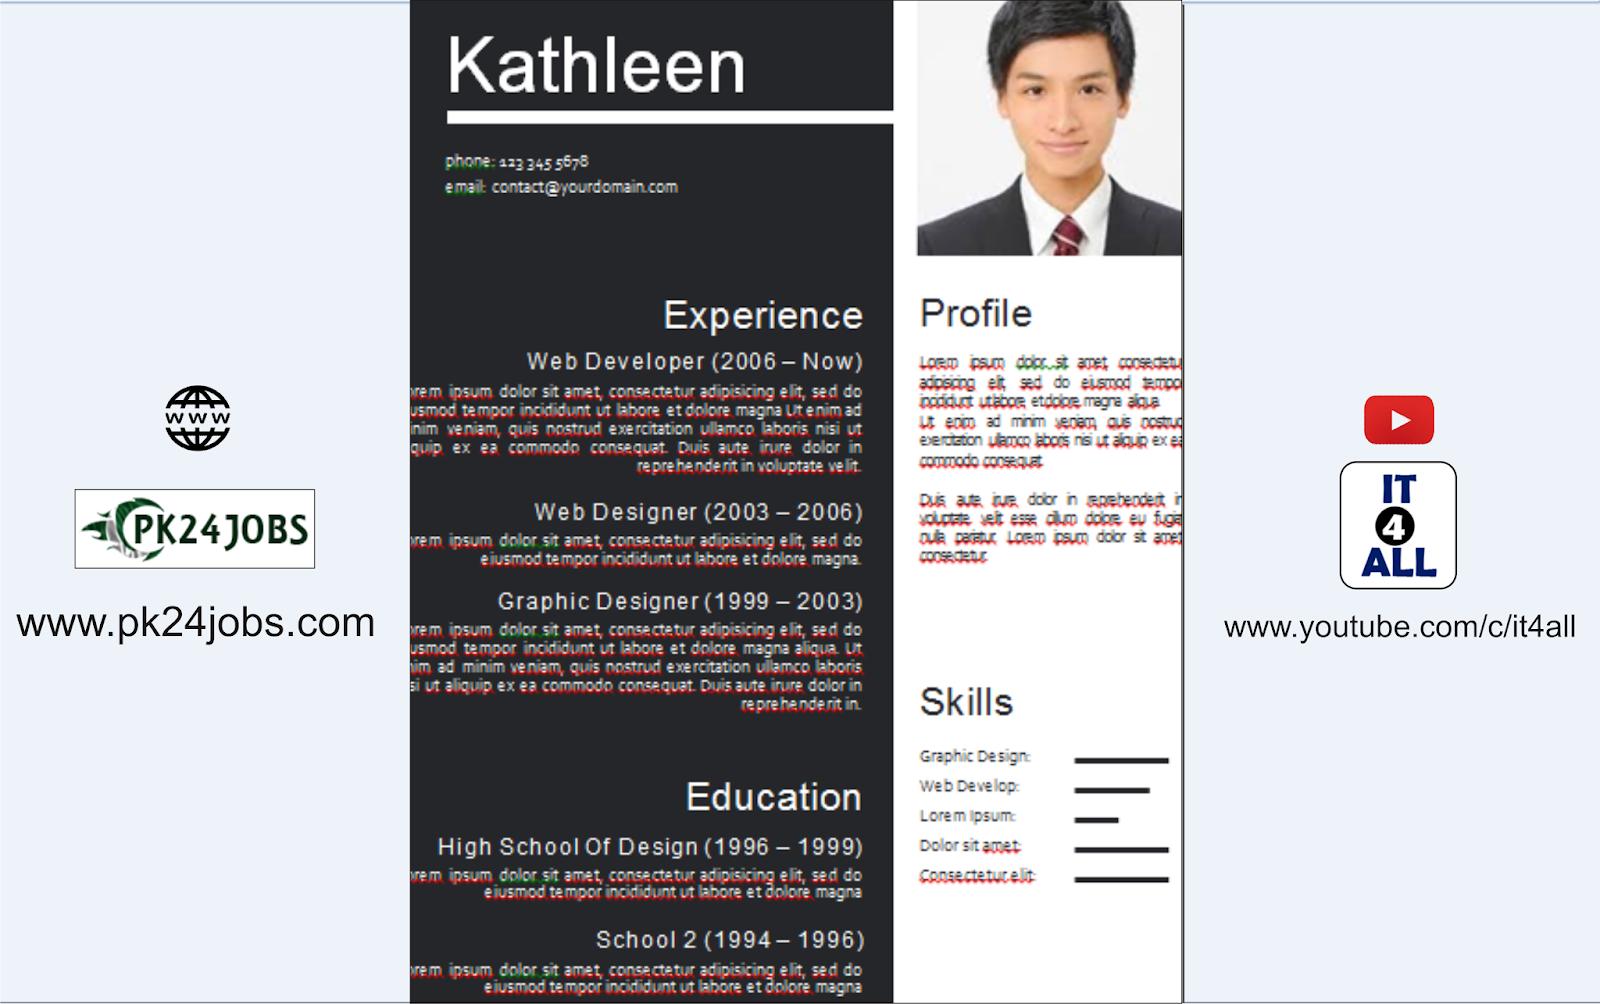 Modern CV Template Free Download Editable in MS Word